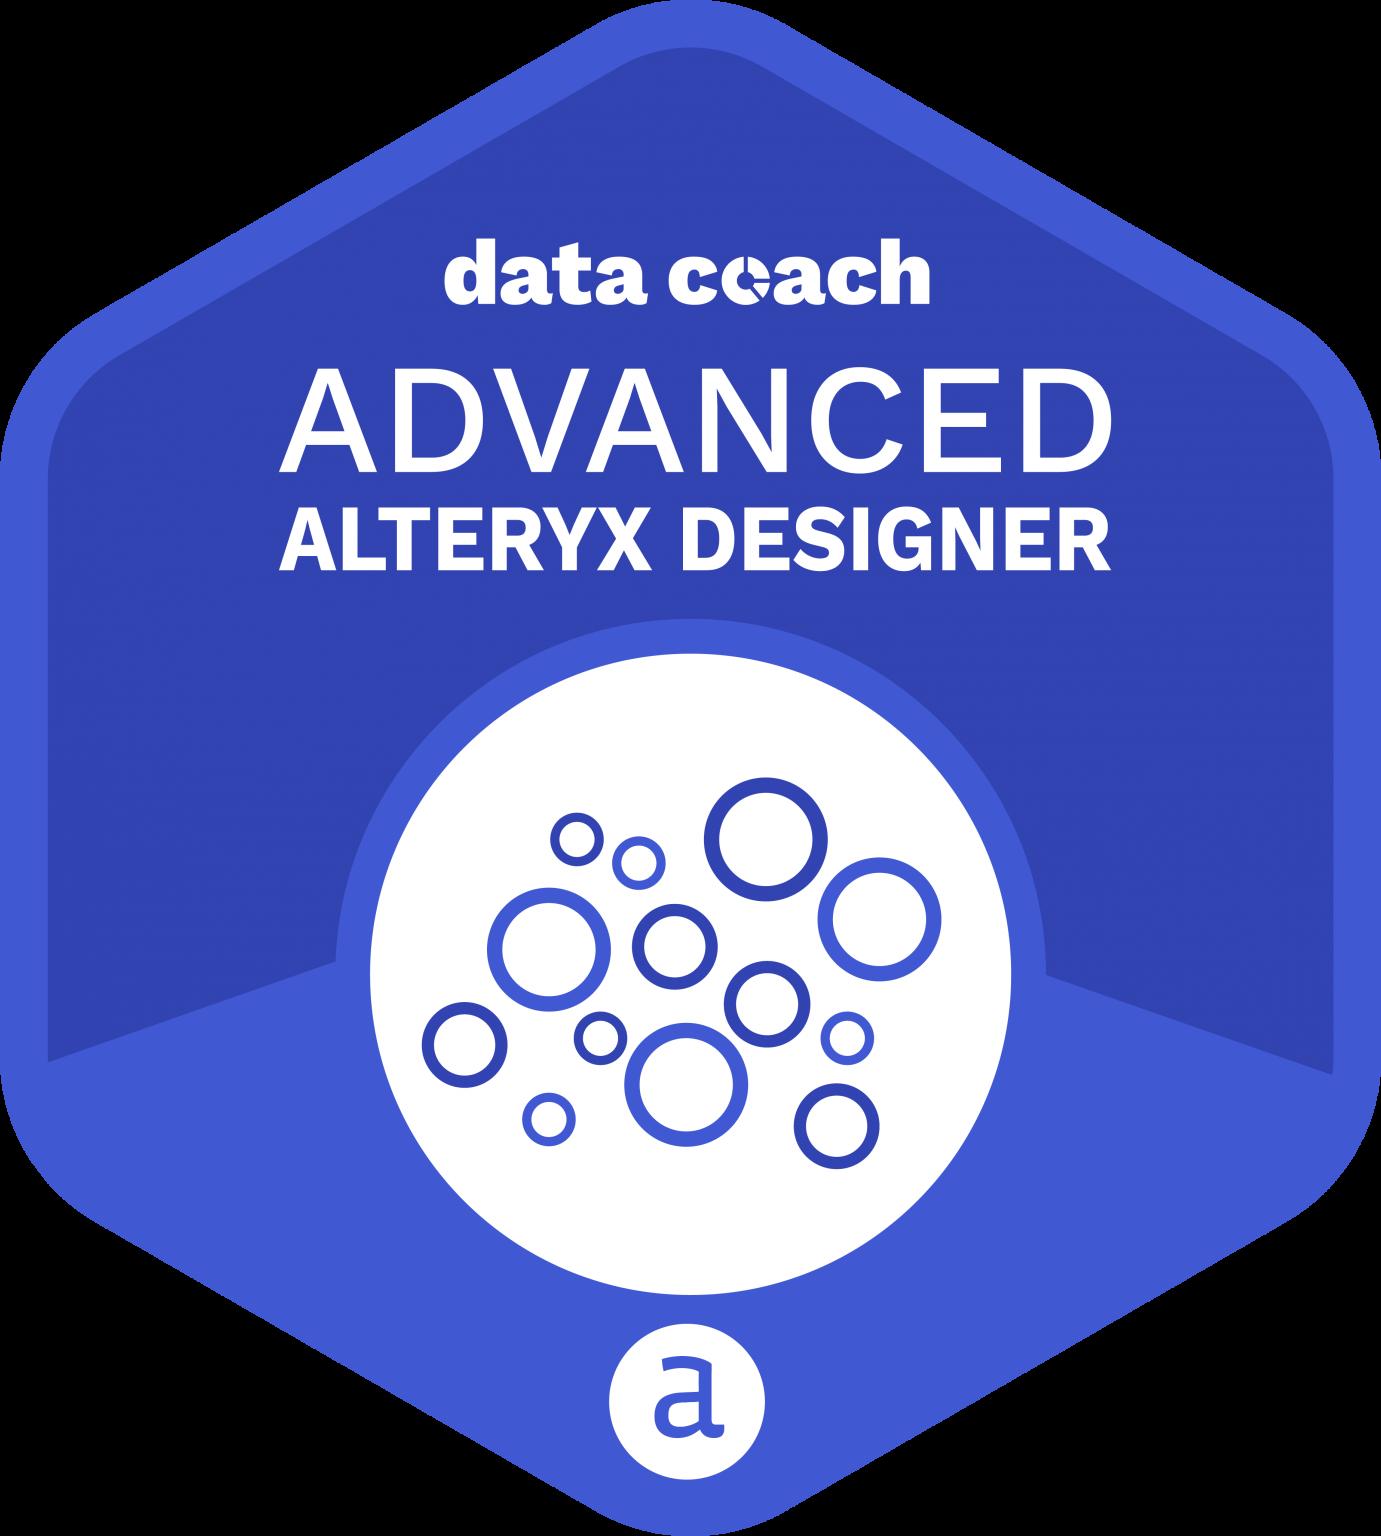 Alteryx-Designer-Advanced